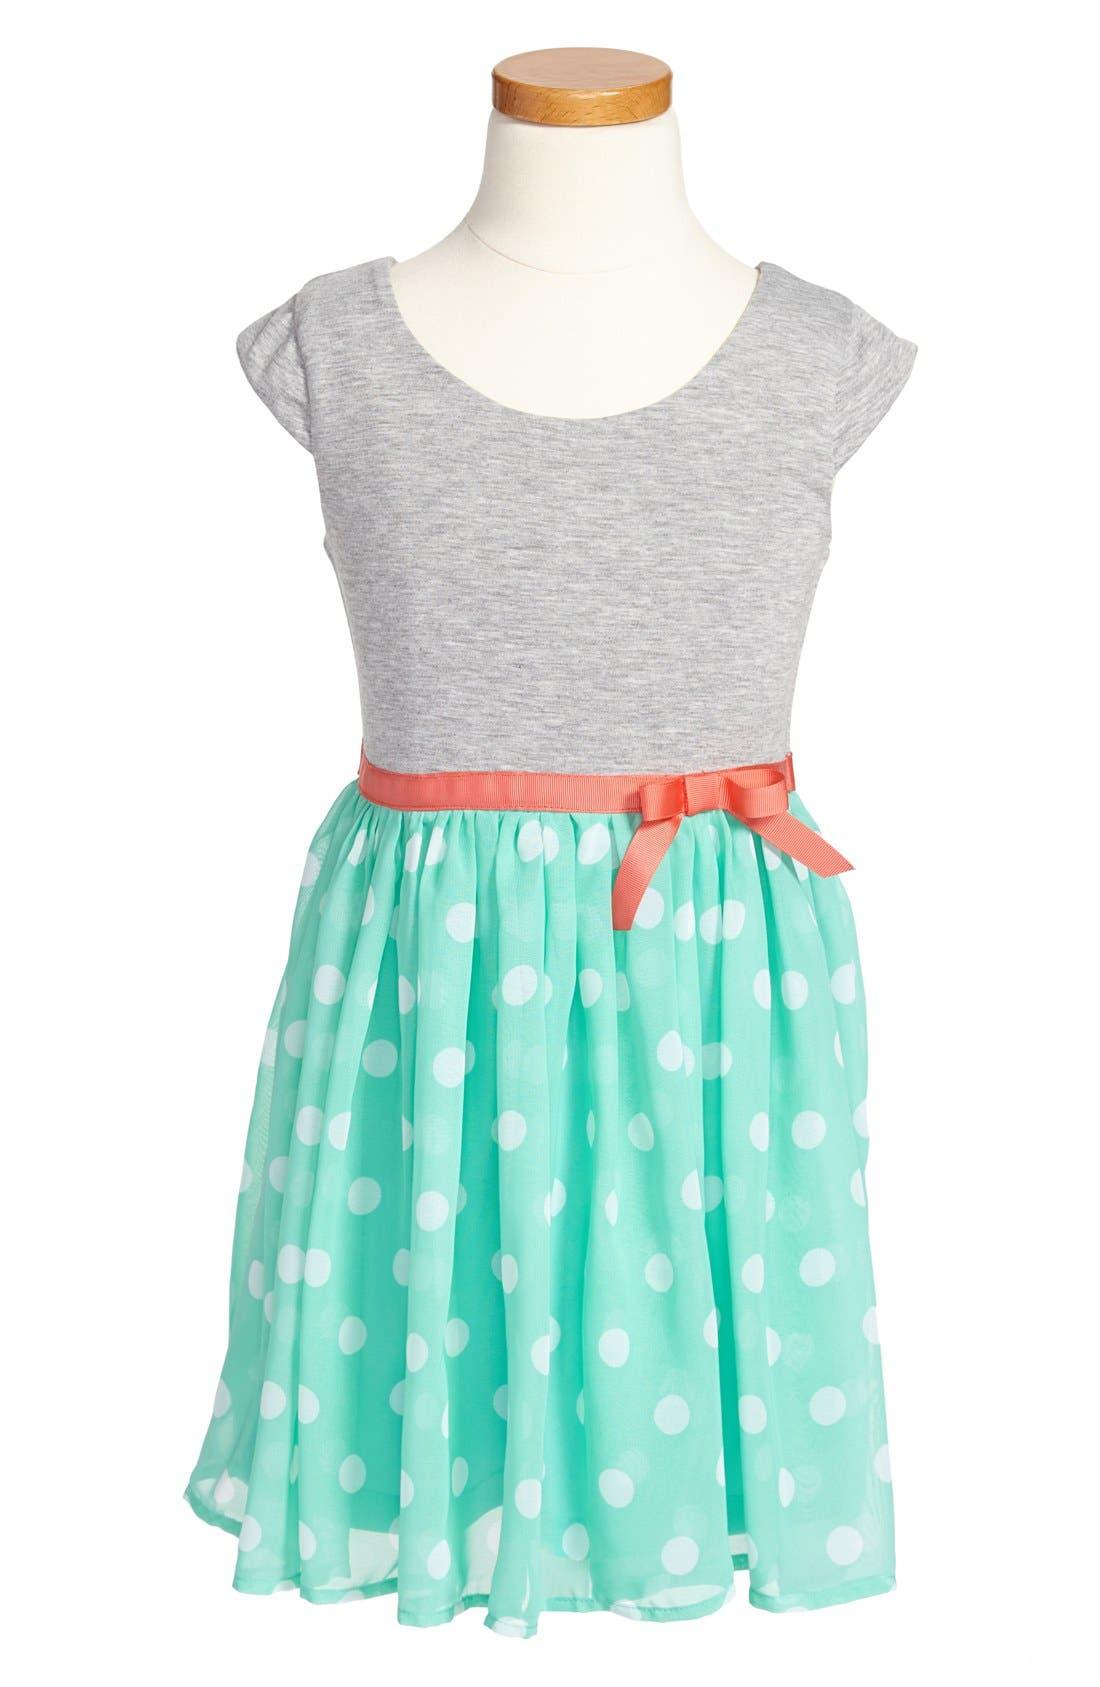 Alternate Image 1 Selected - Zunie Print Skater Dress (Little Girls & Big Girls)